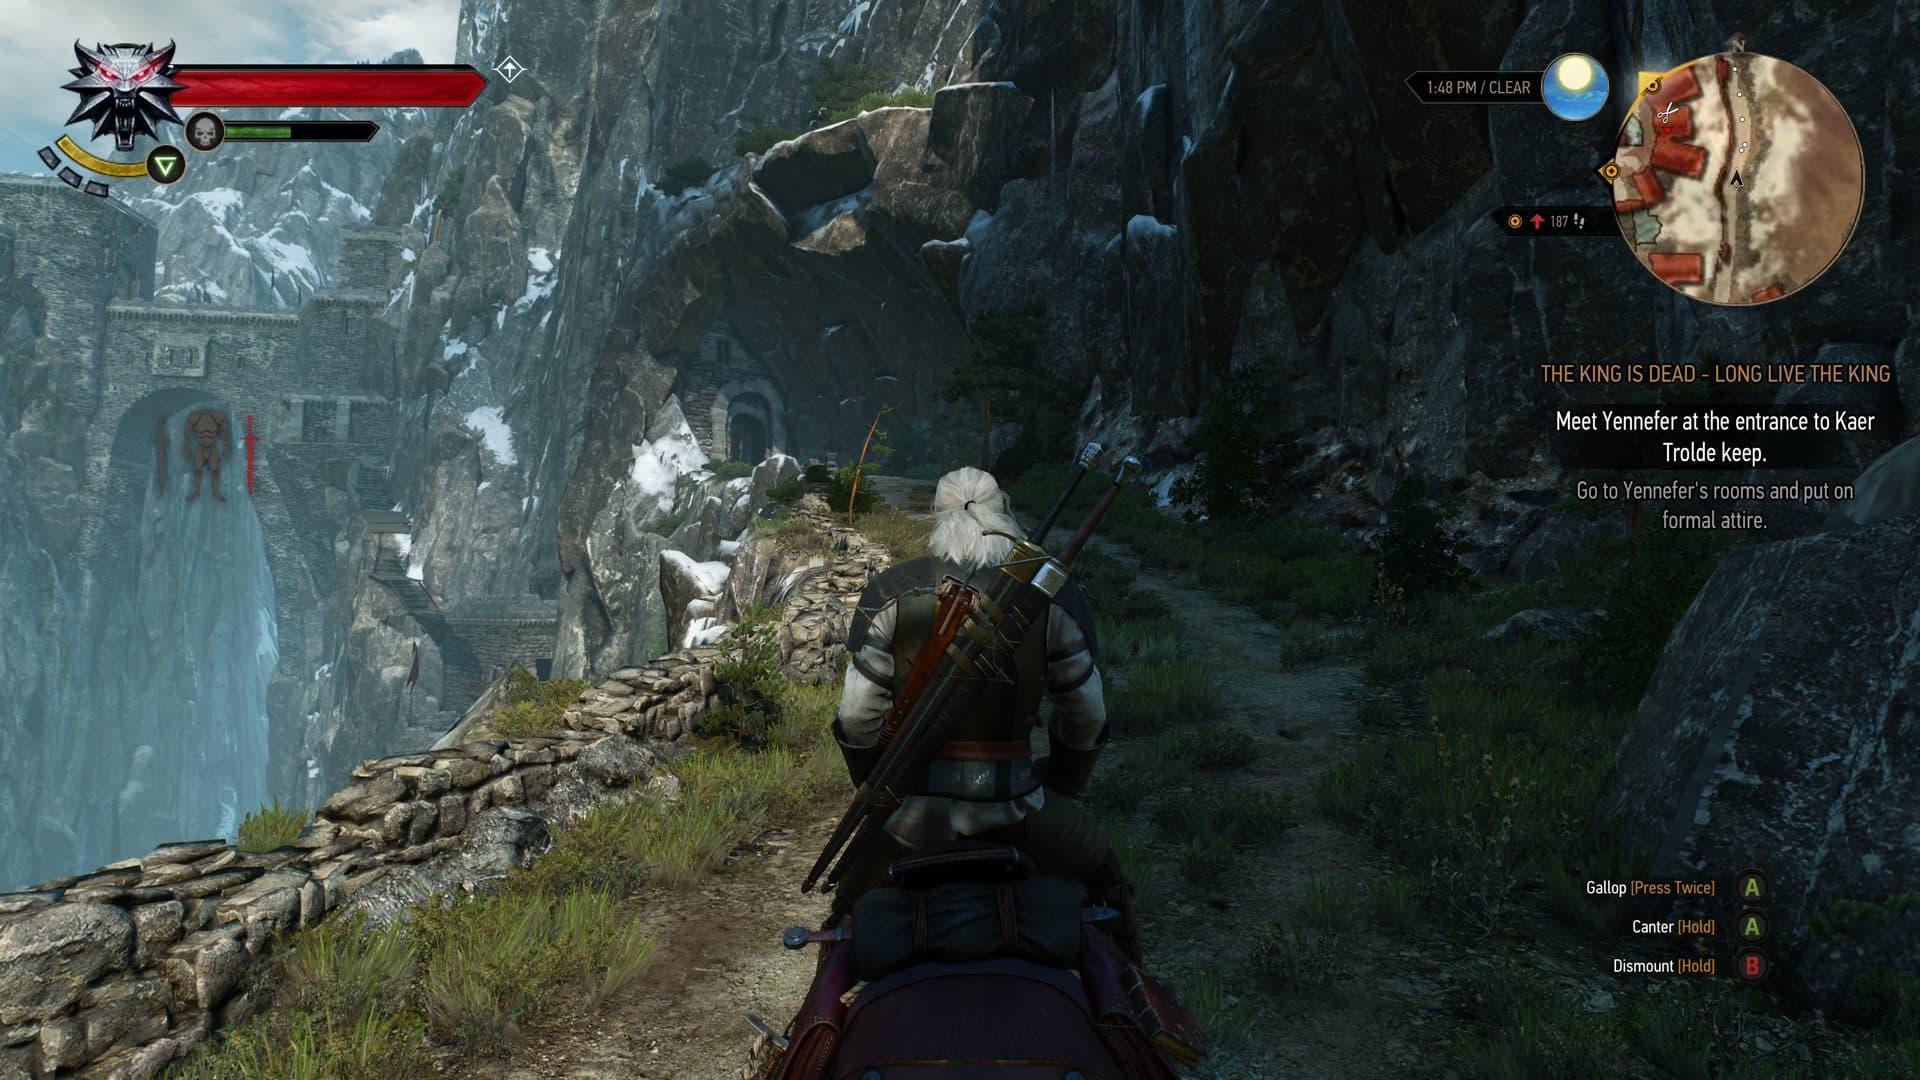 The Witcher 3: Wild Hunt Xbox Series X & S